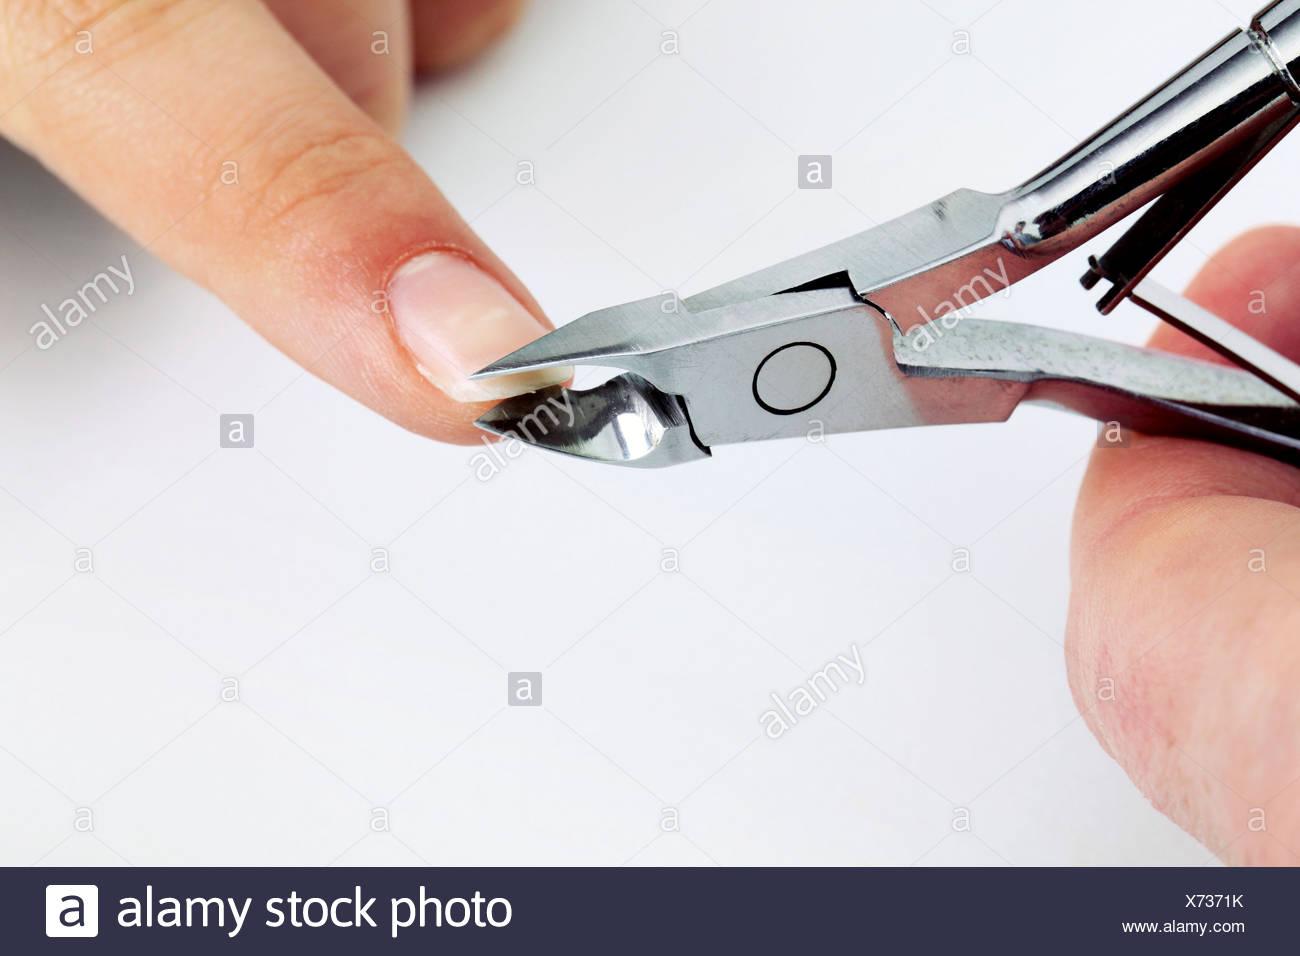 Manicure - Stock Image